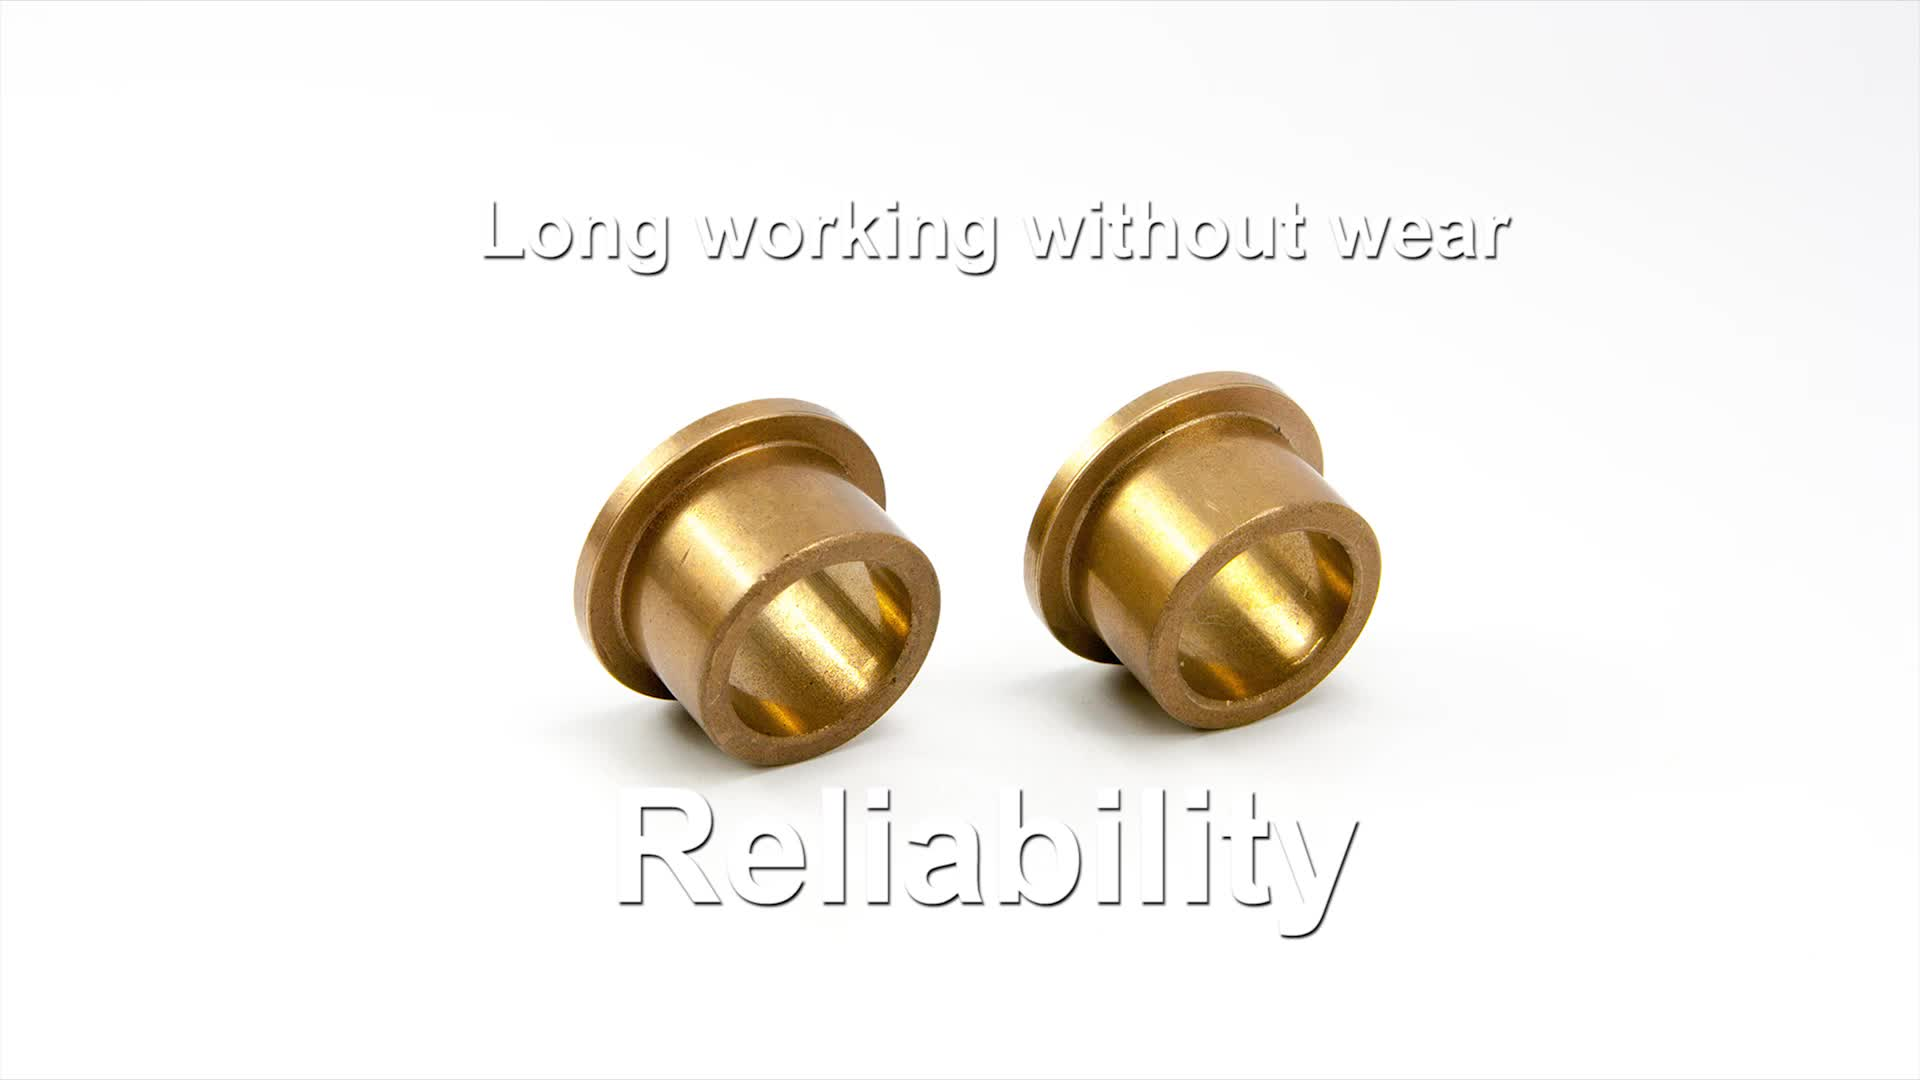 sae841 powder metallurgy oil impregnated sintered oil bronze graphite electric fan motor sleeve bearing flange bushing